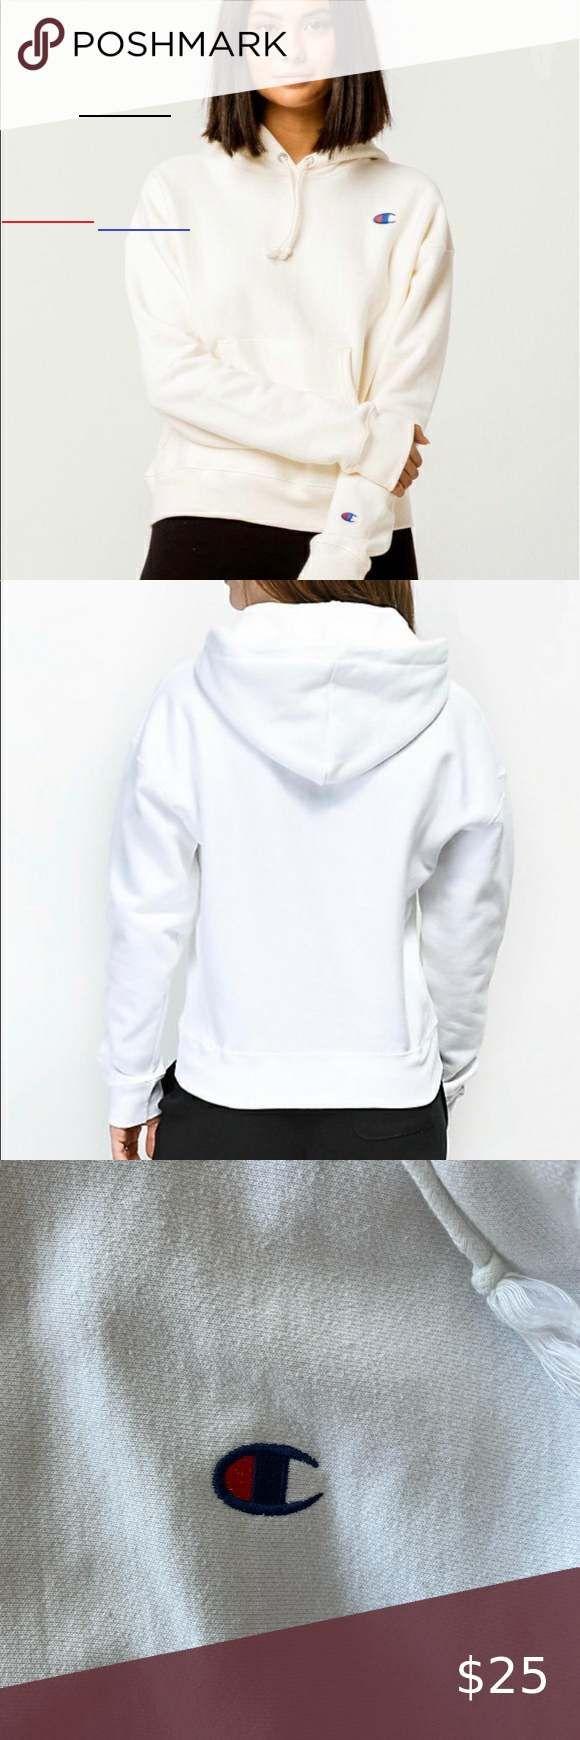 White Champion Hoodie White Xs Champion Tops Sweatshirts Hood Championhoodie White Champion Hoodie Wh In 2020 Kapuzenpulli Kapuzenpullover Damen Herbstmode [ 1740 x 580 Pixel ]